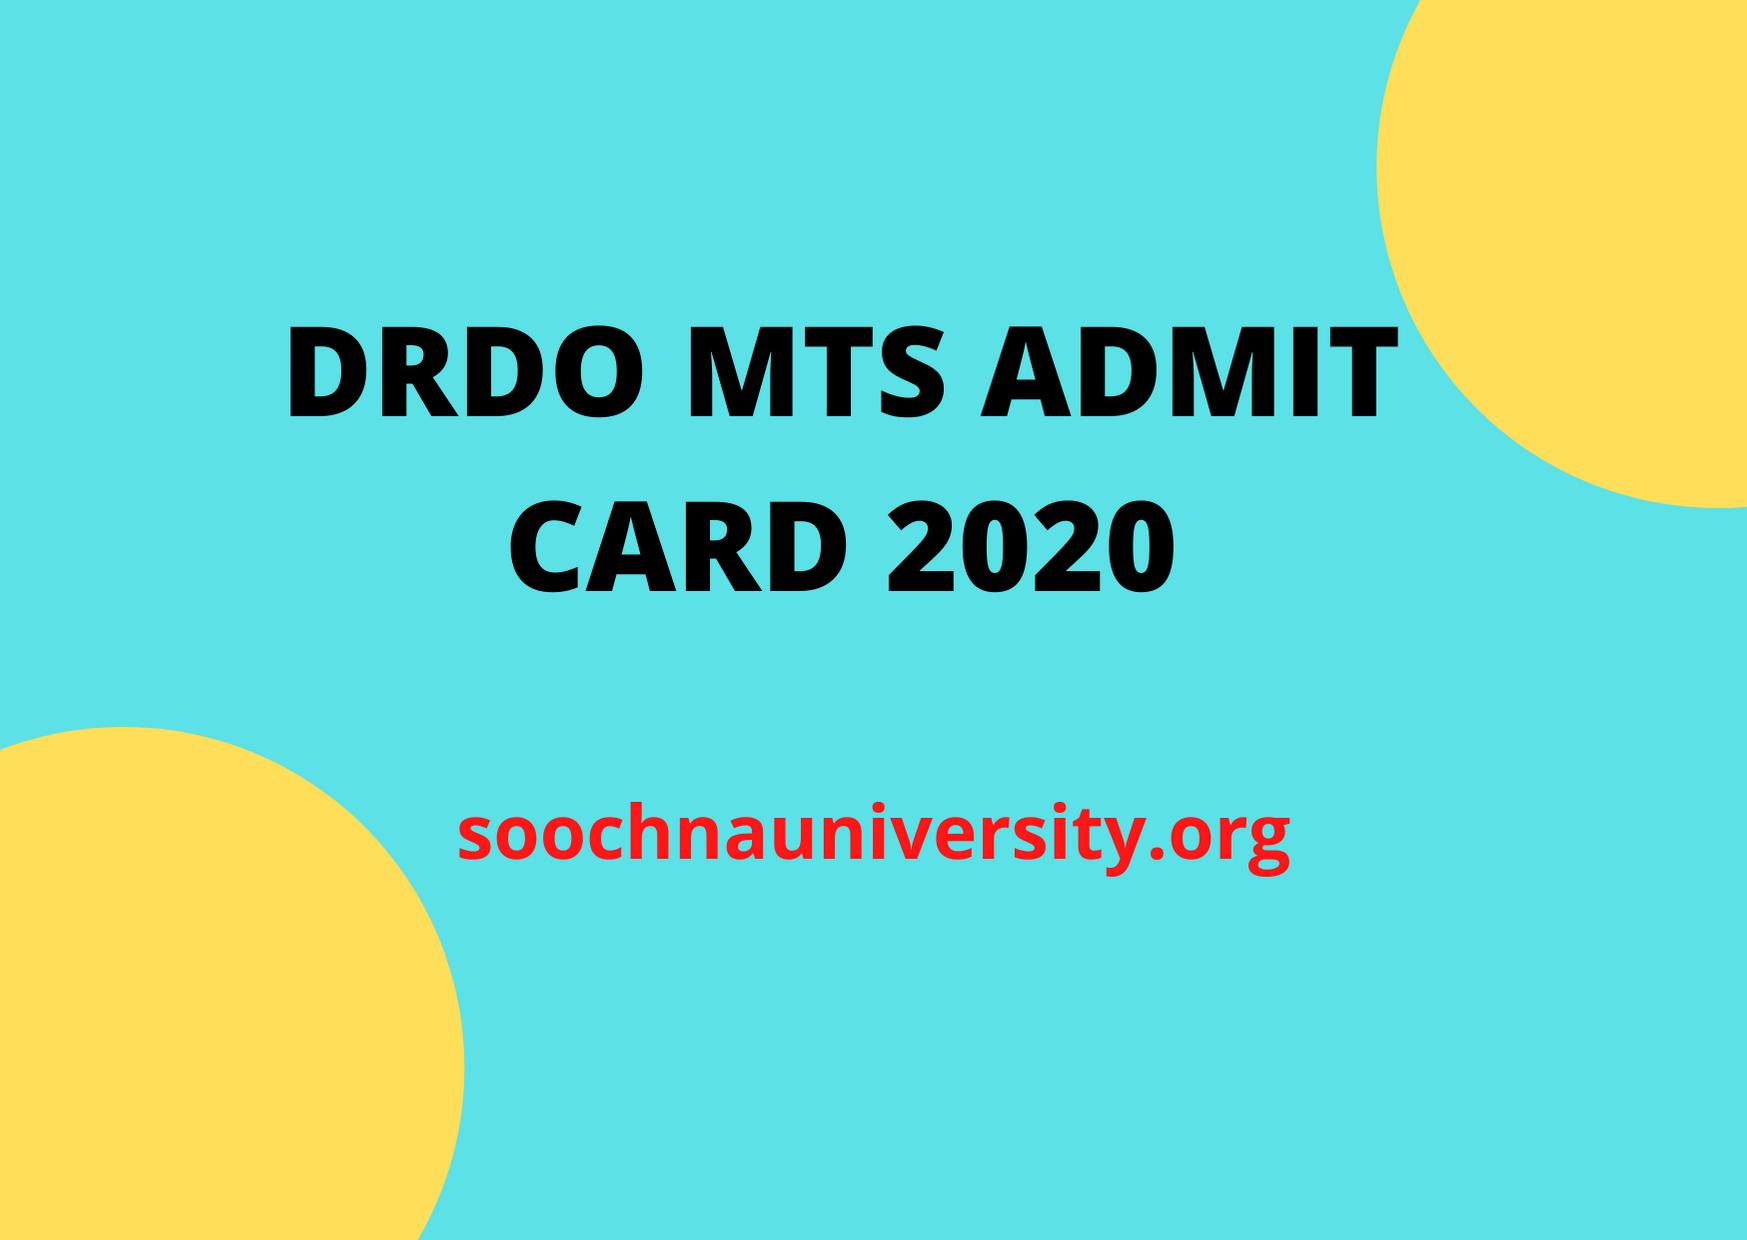 drdo-mts-admit-card-2020